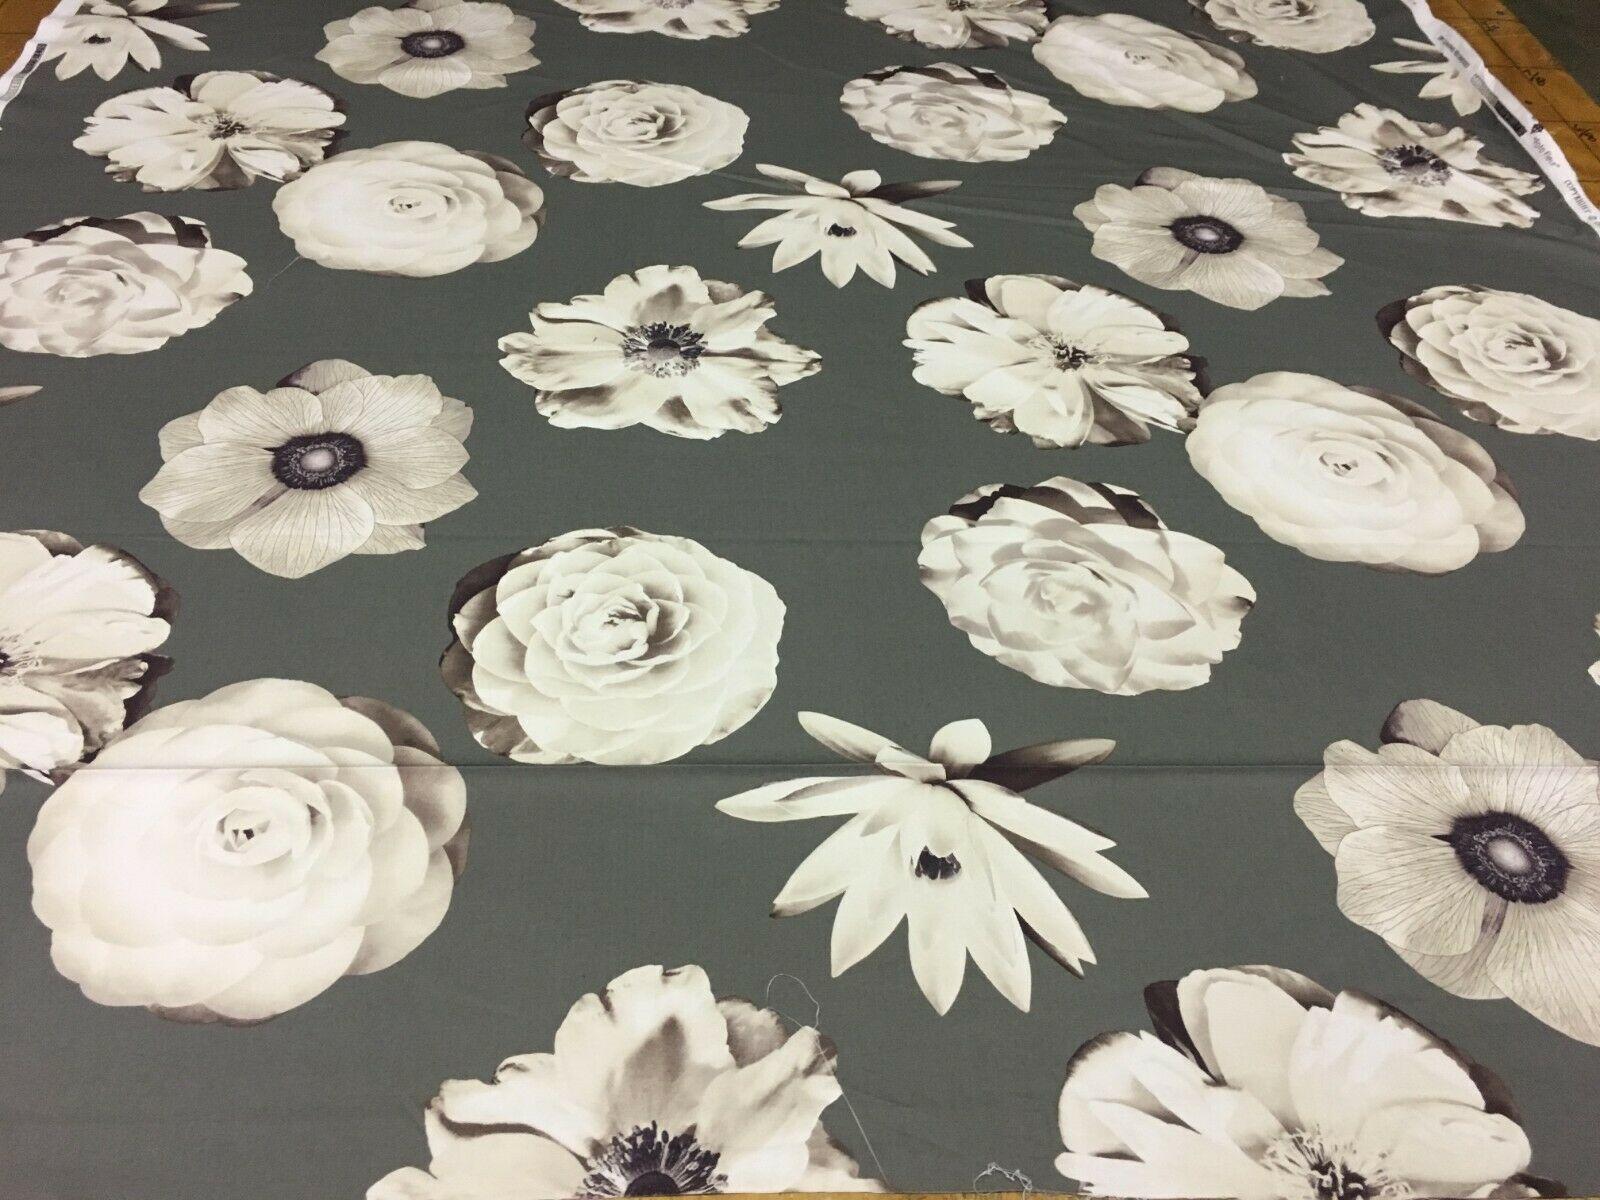 Iman Home Foto Fleur Floral Print Multi-Purpose Cotton Fabric 1.75 yards - FF3